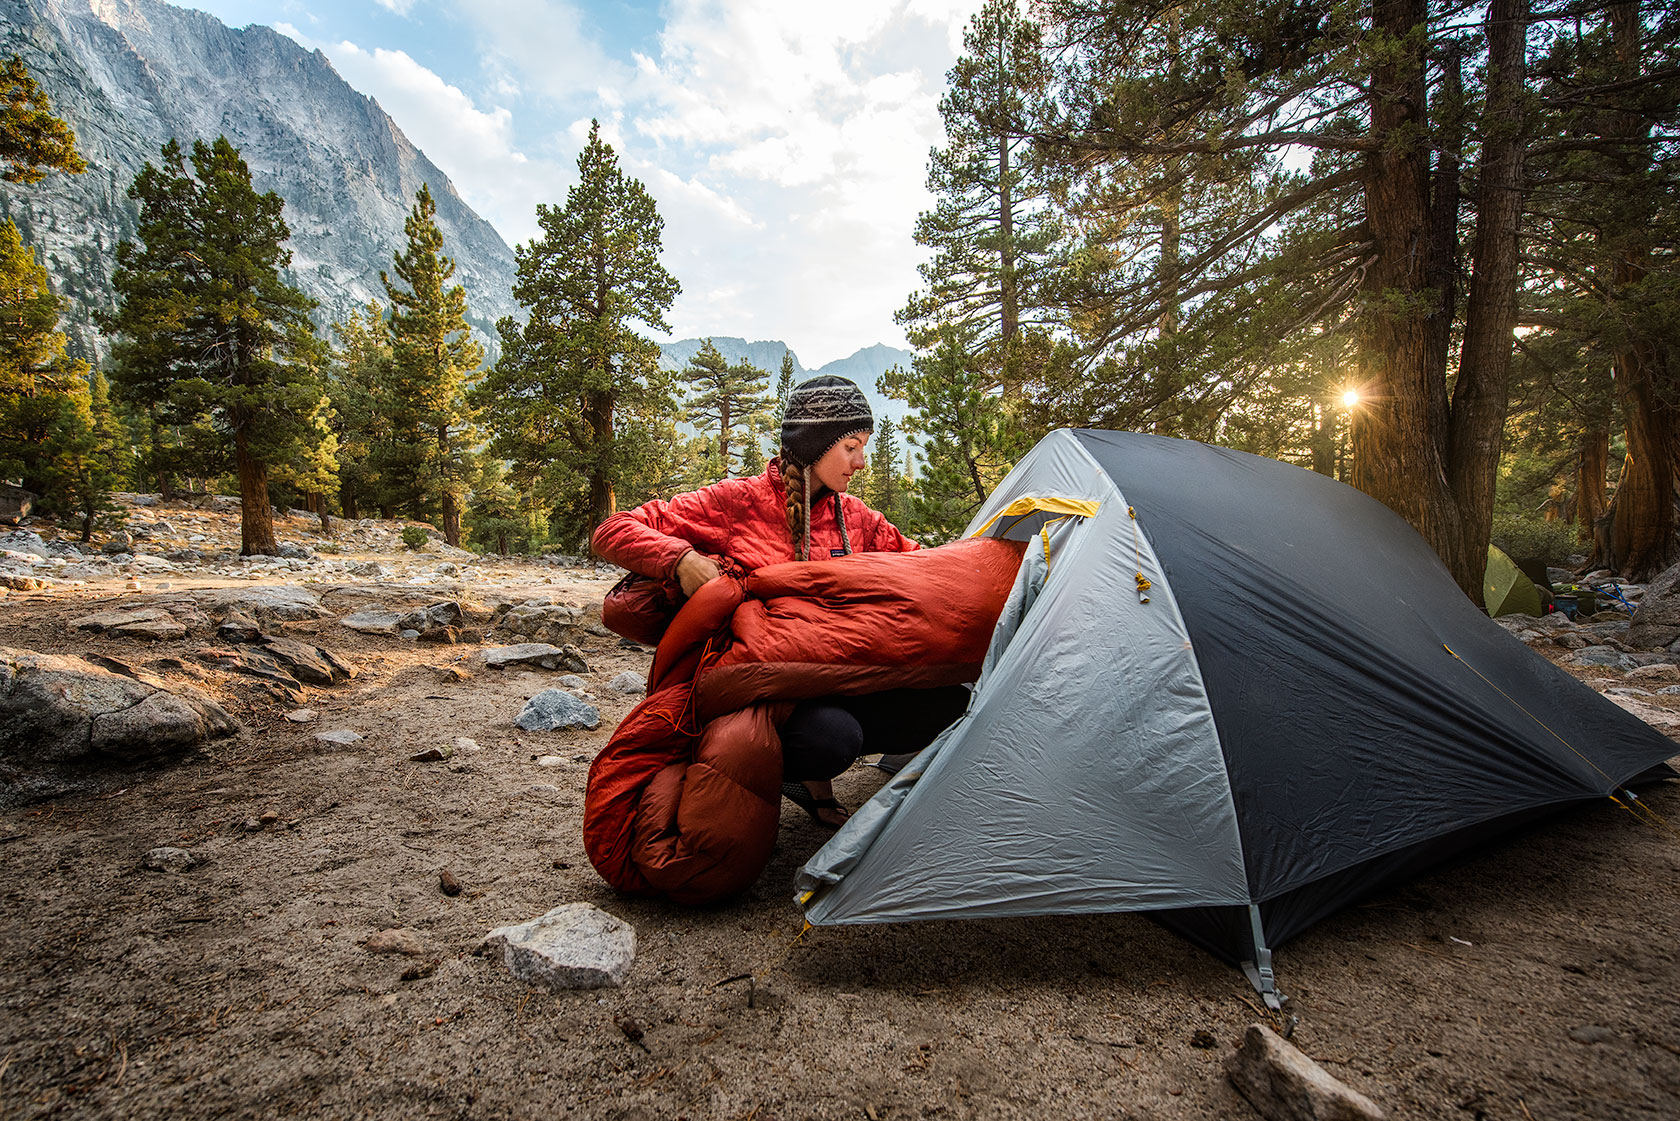 austin-trigg-big-agnes-tent-john-muir-trail-camping-sleeping-Bag-FlyCreek-Sierra-Golden-Gate-Bridge.jpg